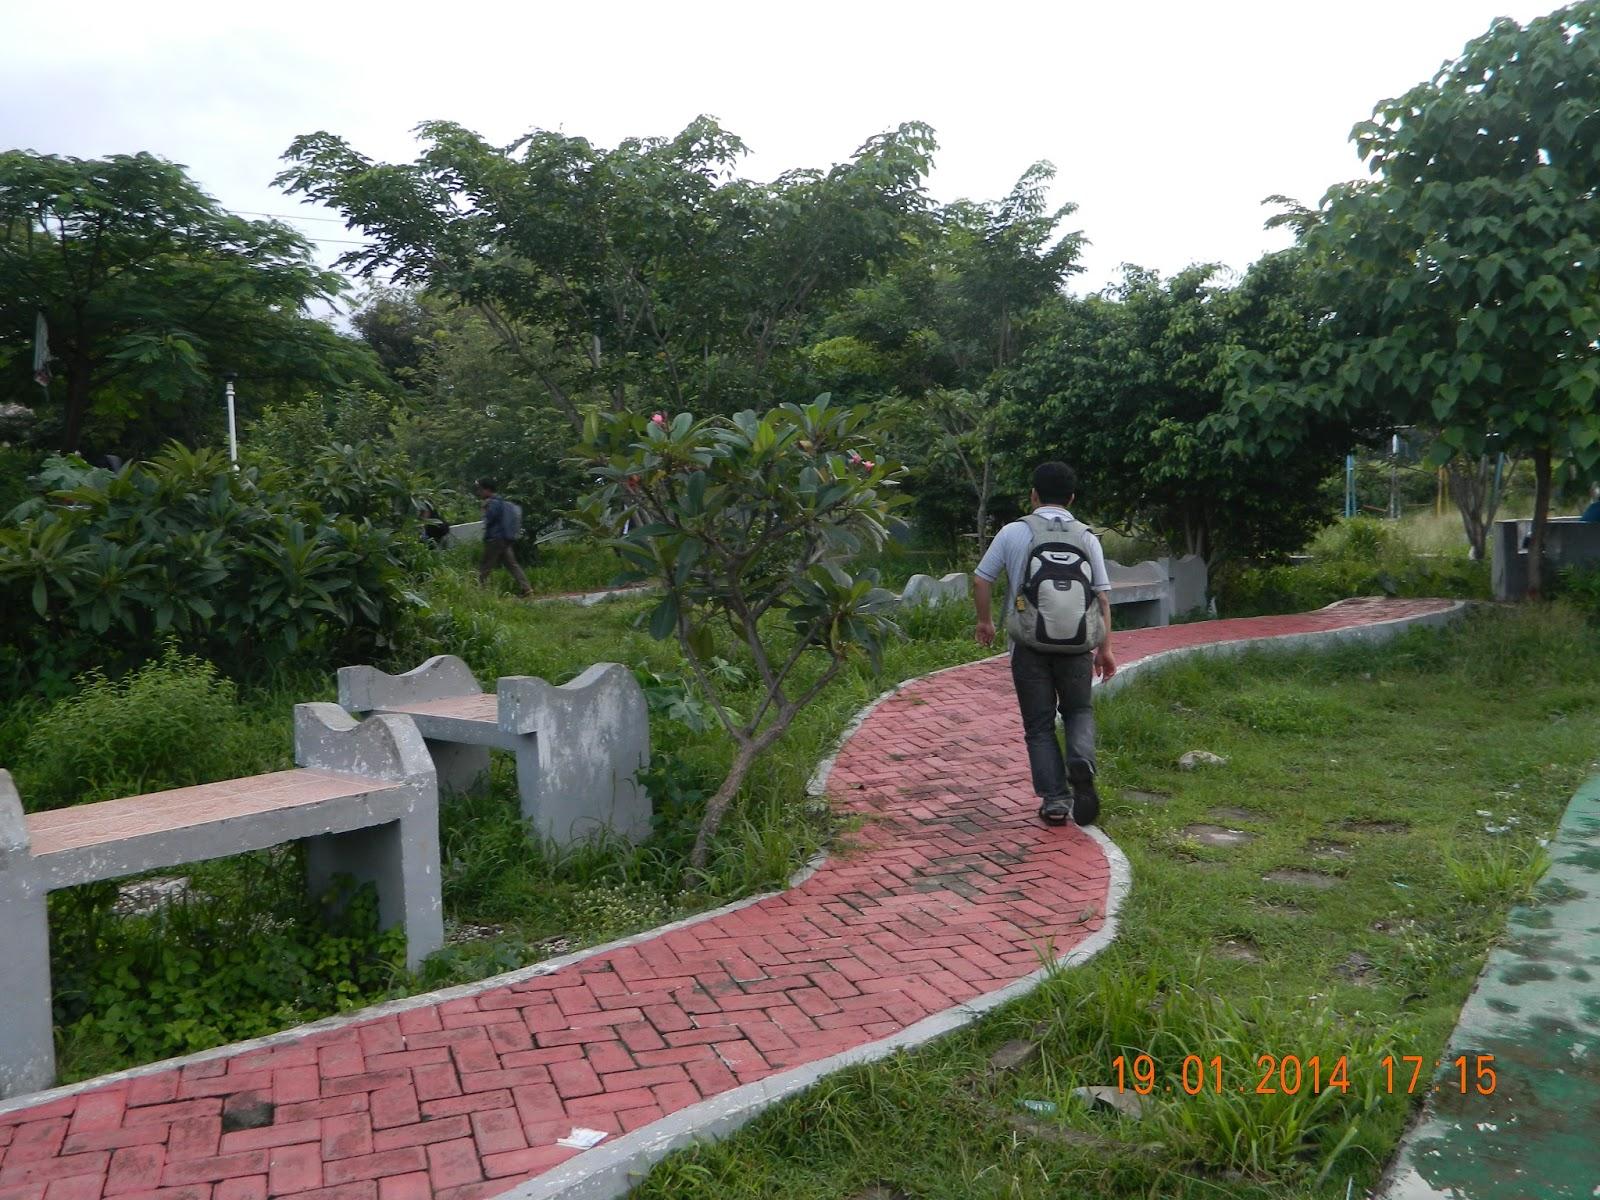 27 Maret 2016 Galuh Saina Van Bemmelen Taman Nostalgia Pratiwi